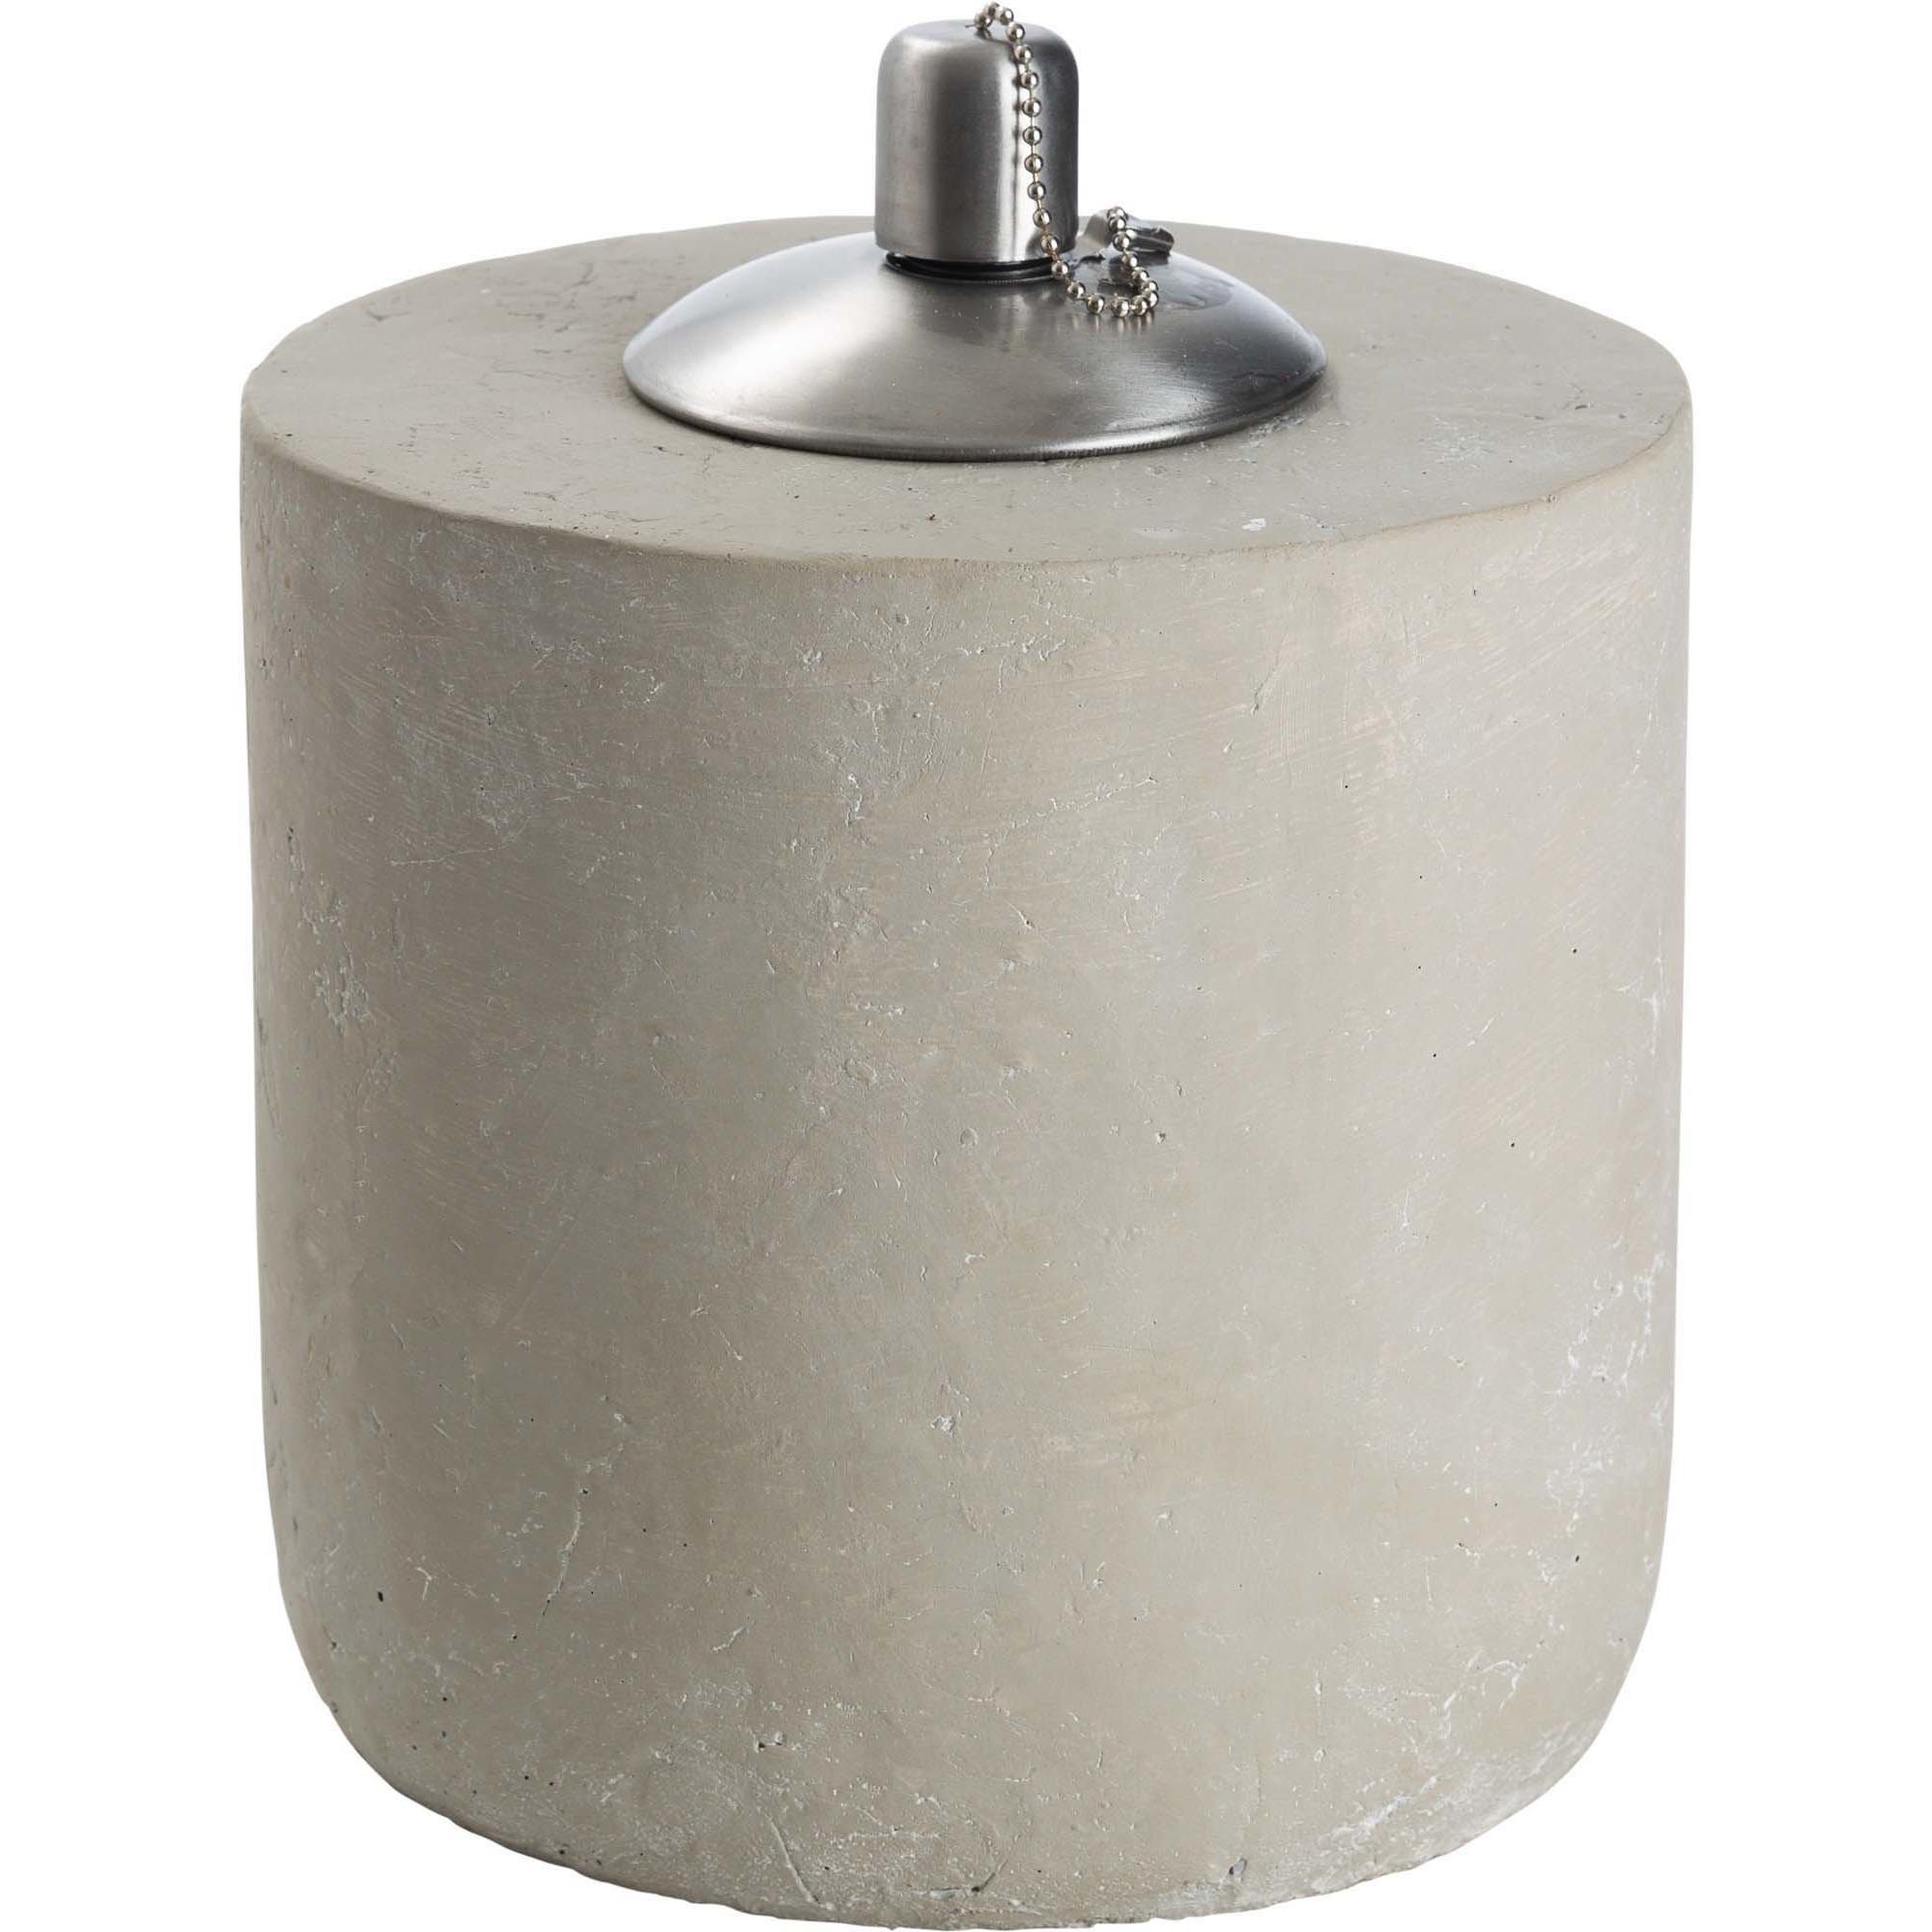 Ernst Oljelykta i cement d18 h175